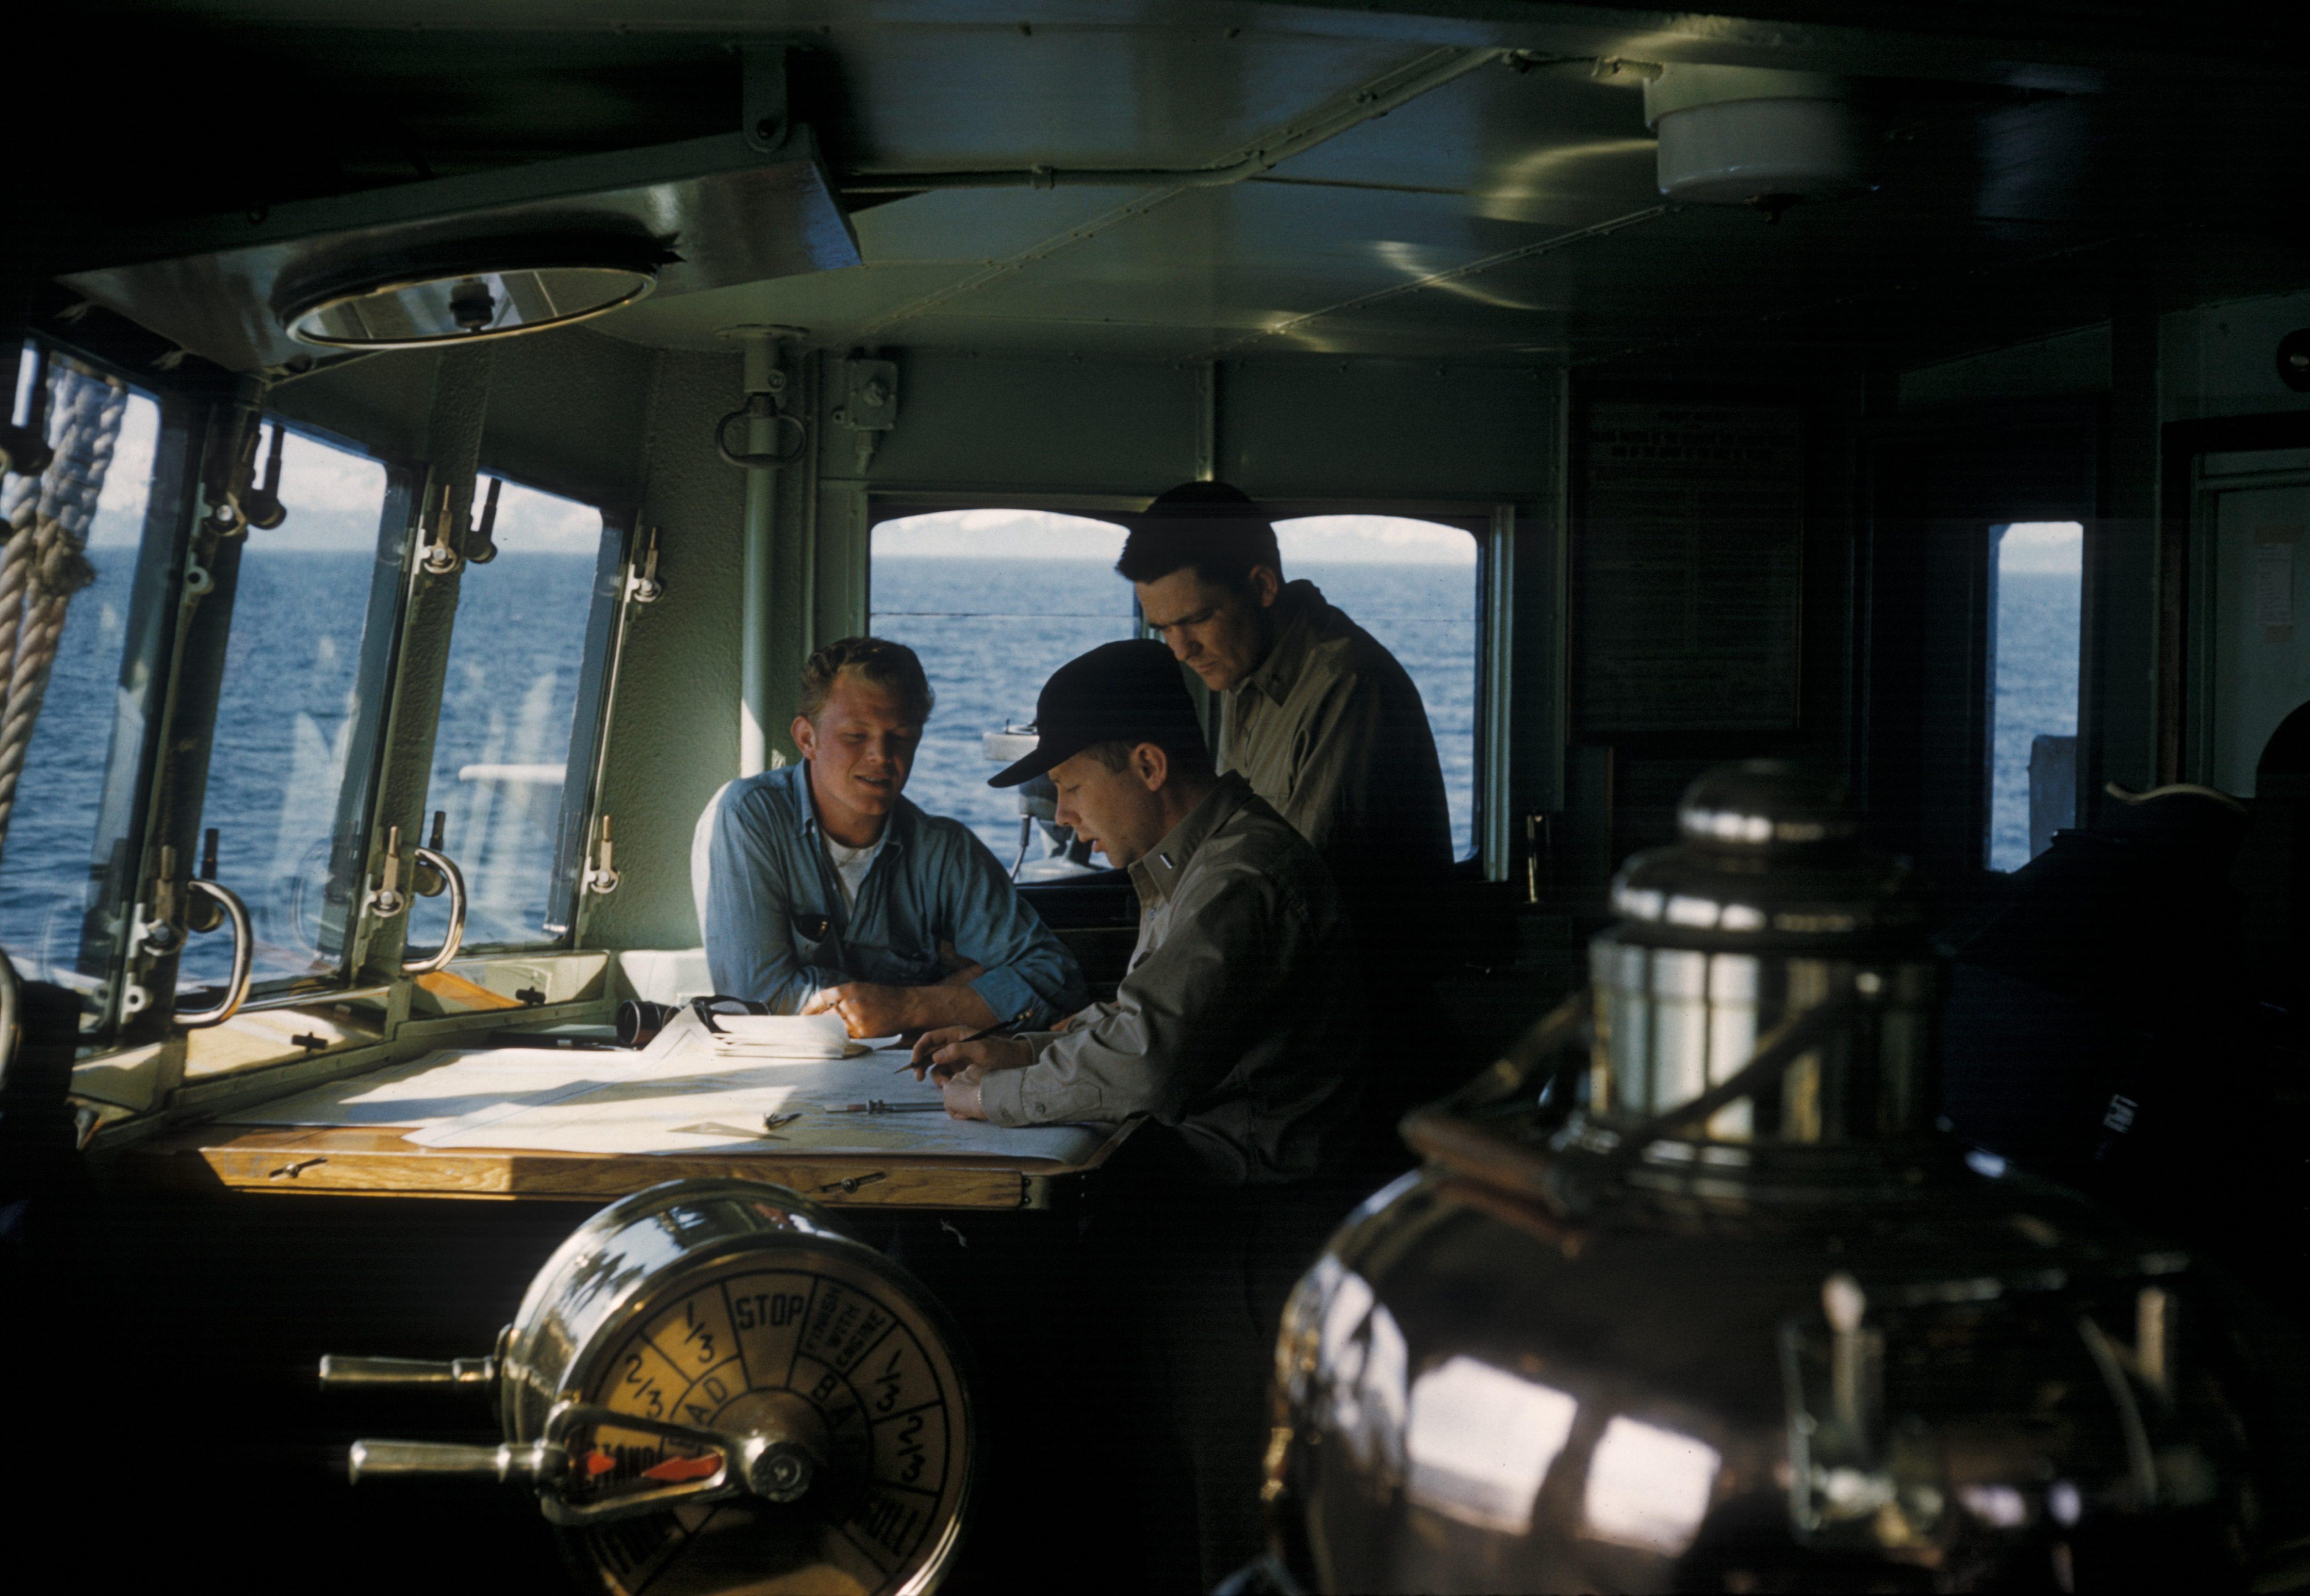 Vessel Crewing Software